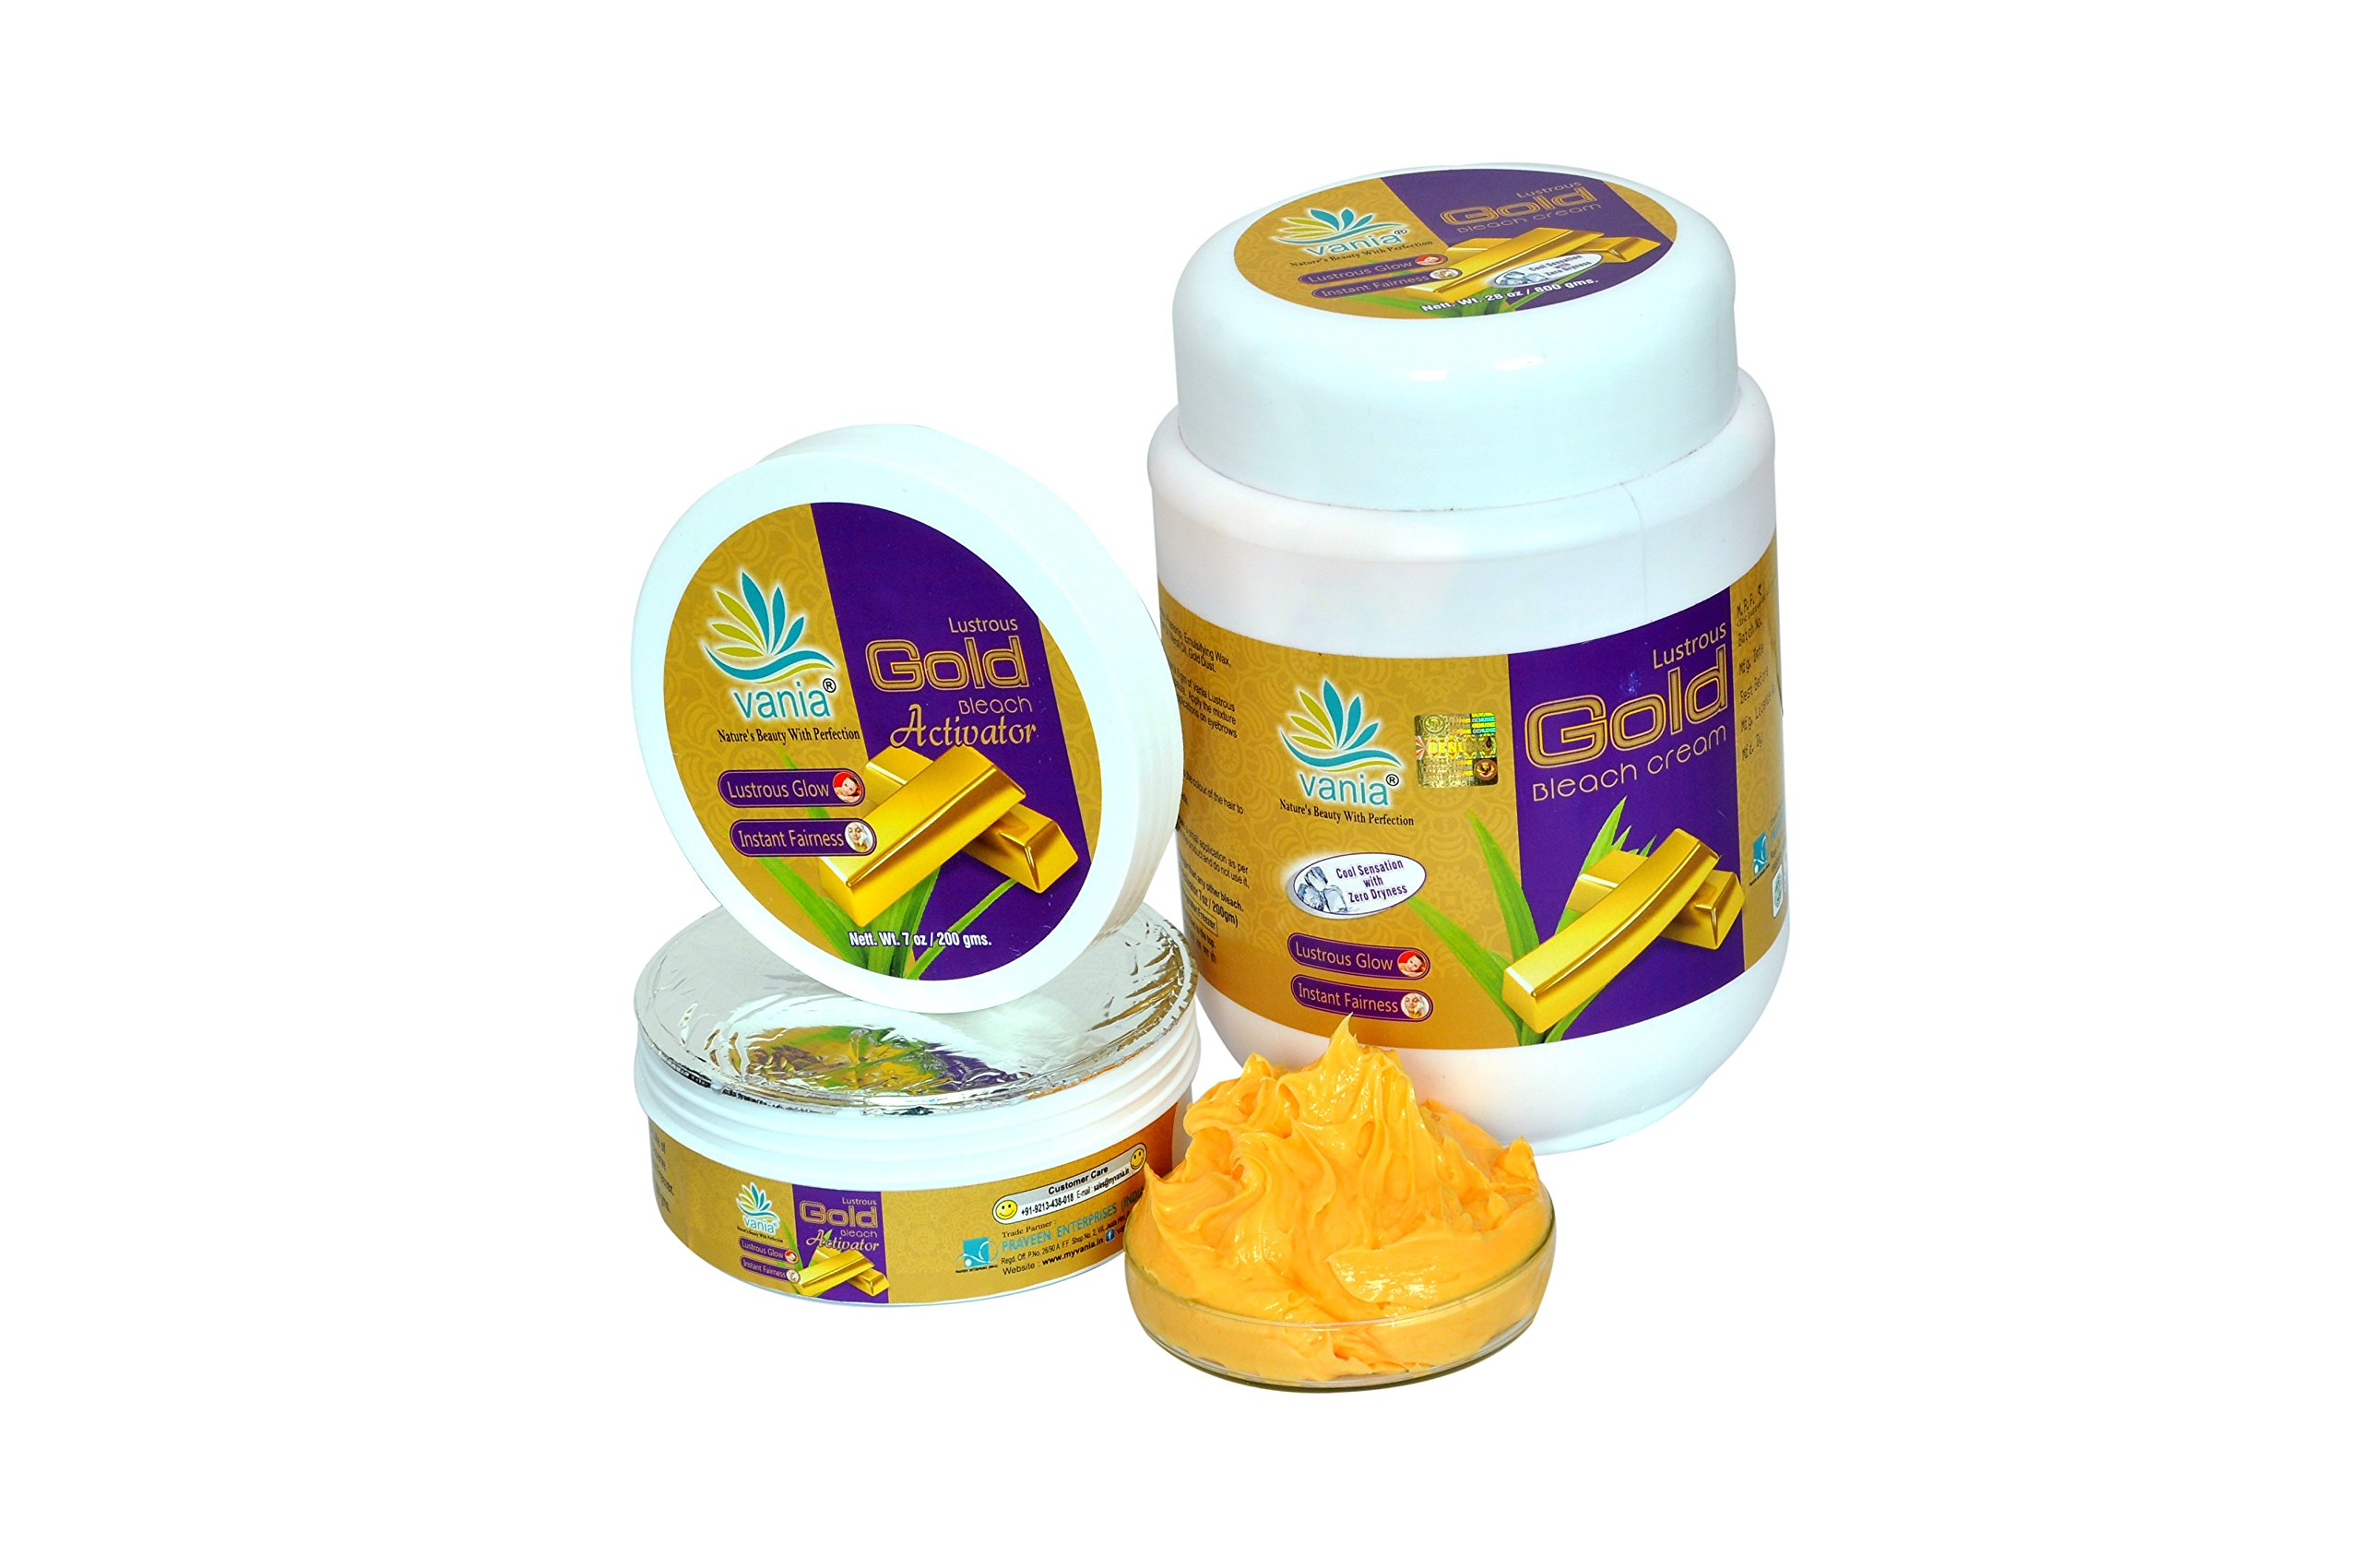 Vania Gold Bleach Cream 1000 Gm product image